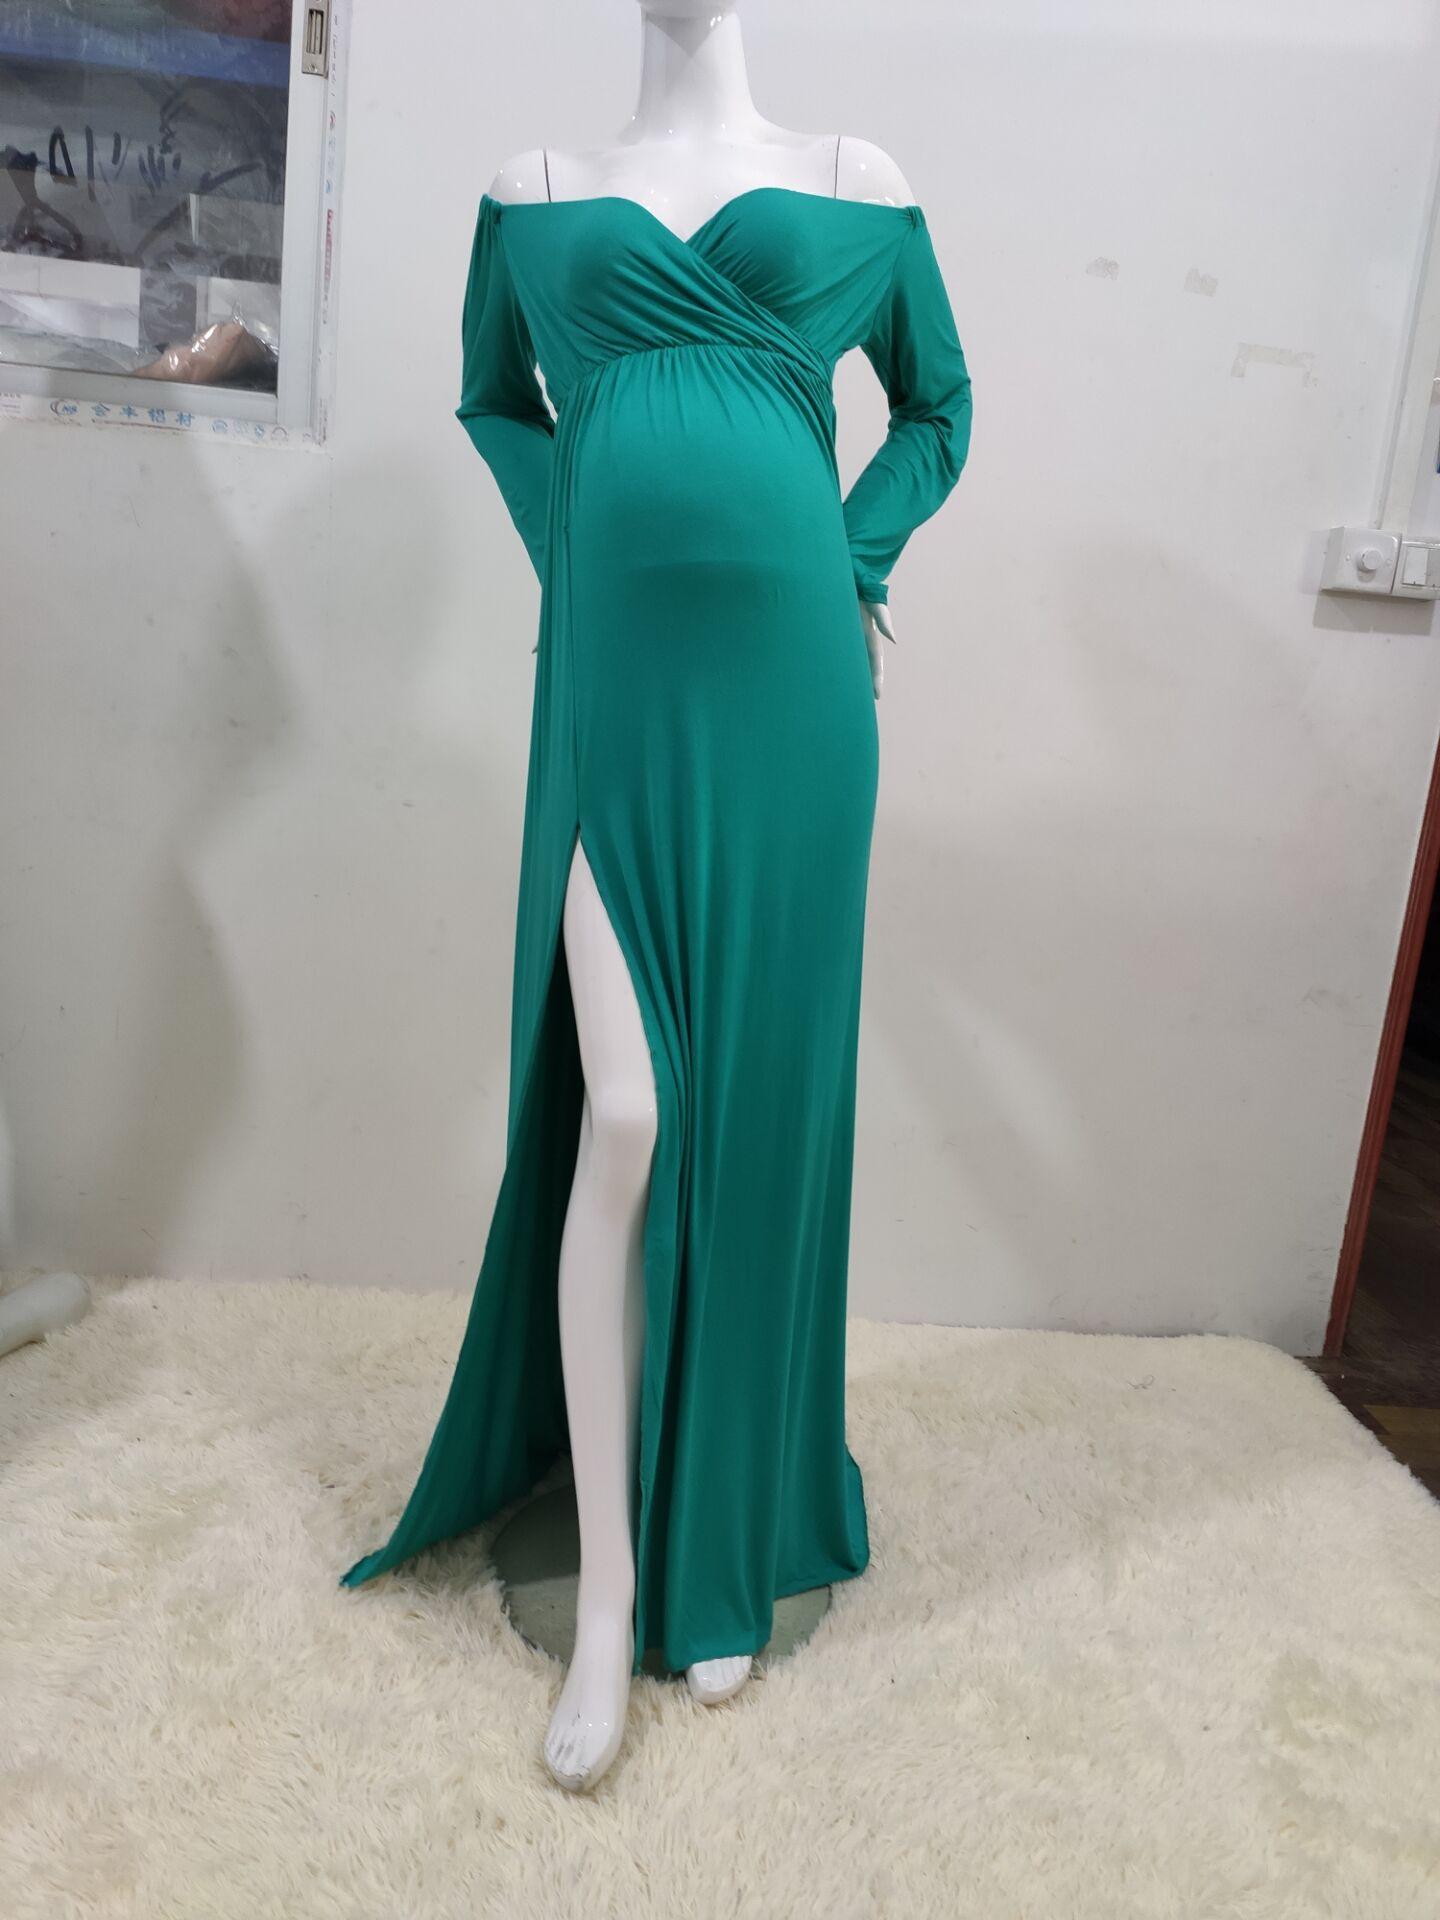 Photo Shoot Long Pregnancy Slit Open Dress Maternity Maxi Gown Slash Neck Maternity Photography Dresses Sukienka Ciazowa enlarge